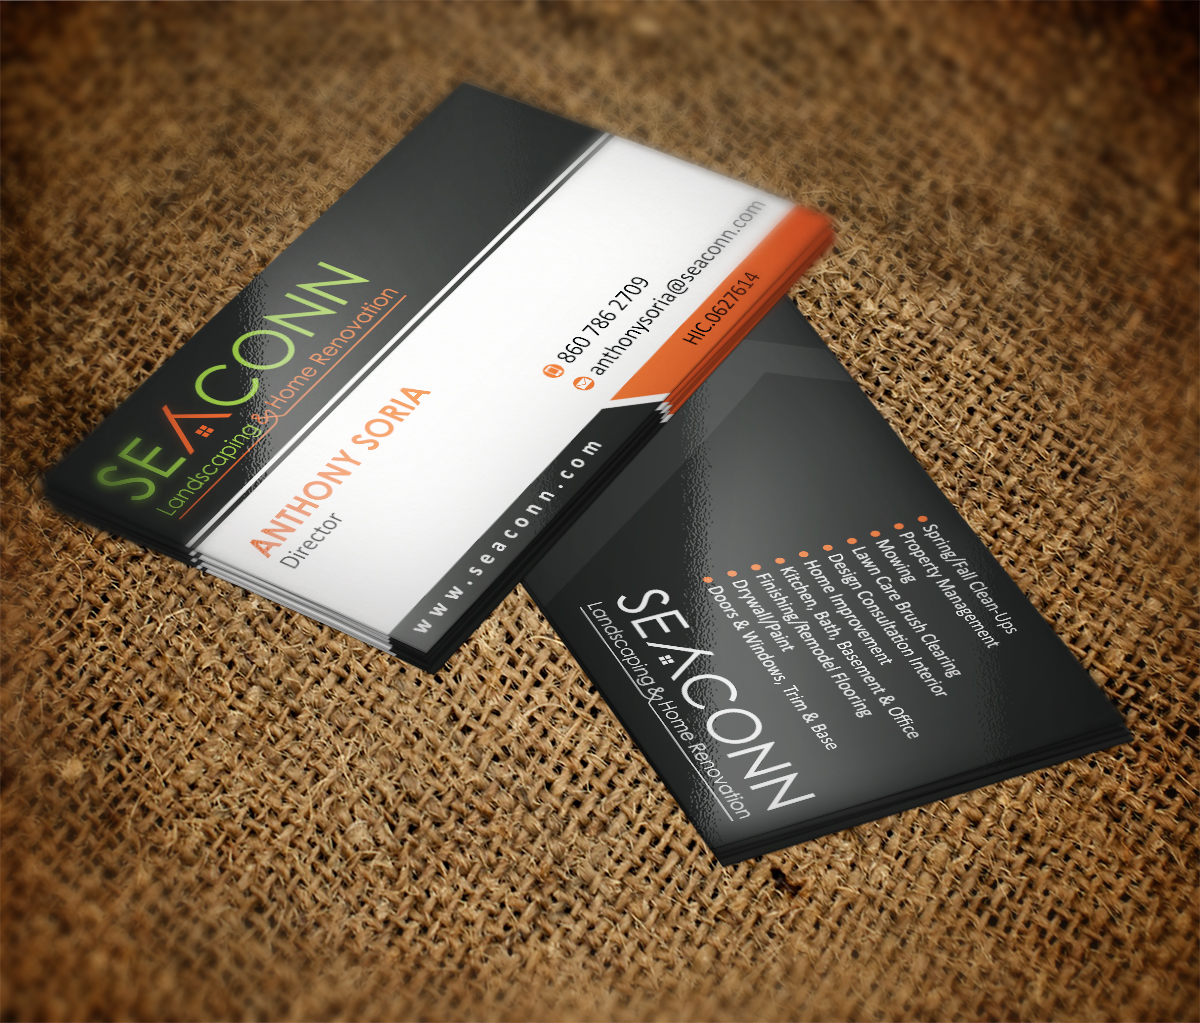 28 business card designs home improvement business card design business card design by mt for seaconn design 3728123 colourmoves